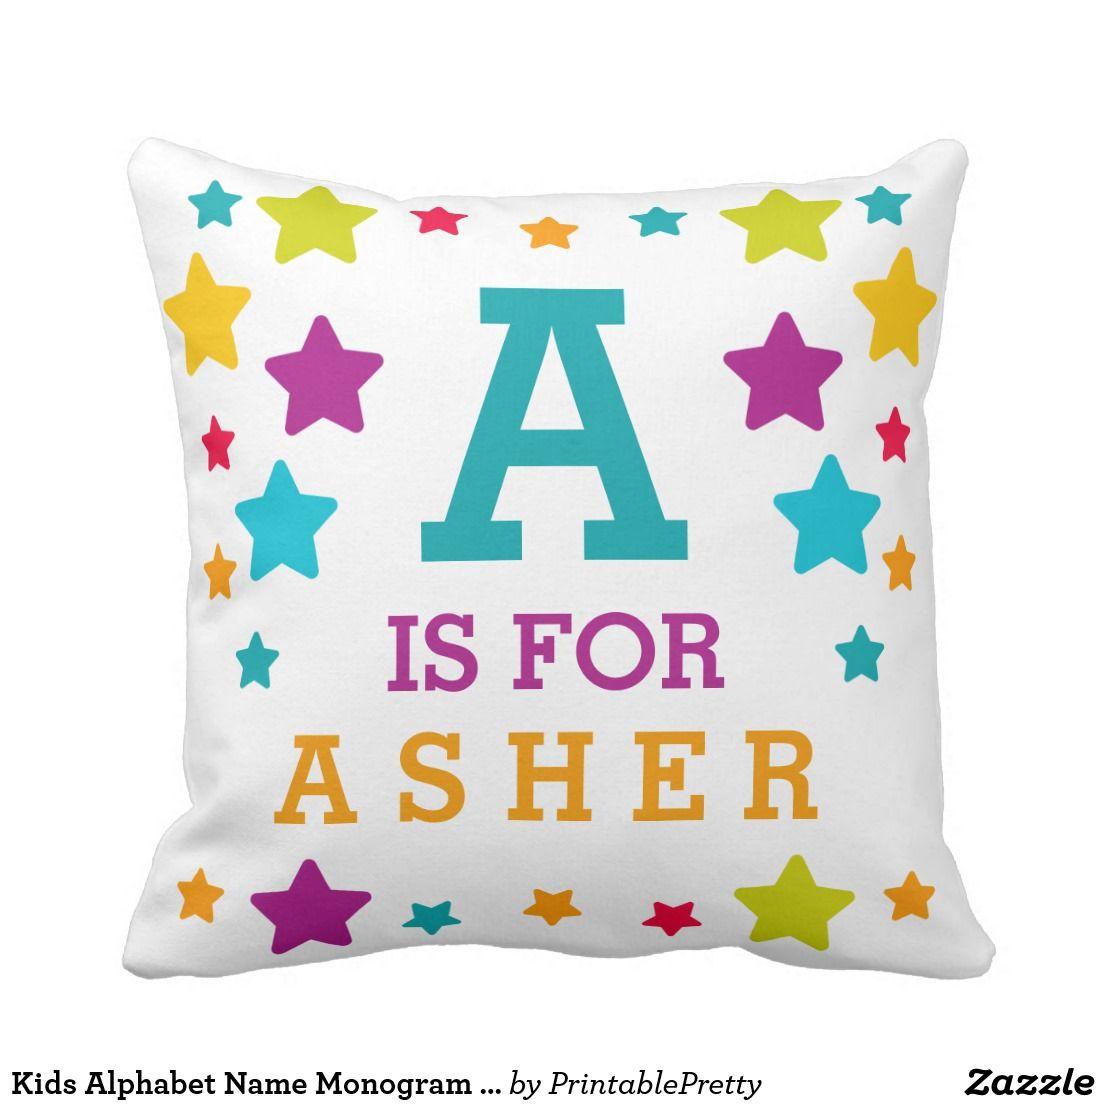 Kids alphabet name monogram stars throw pillow in cute throw